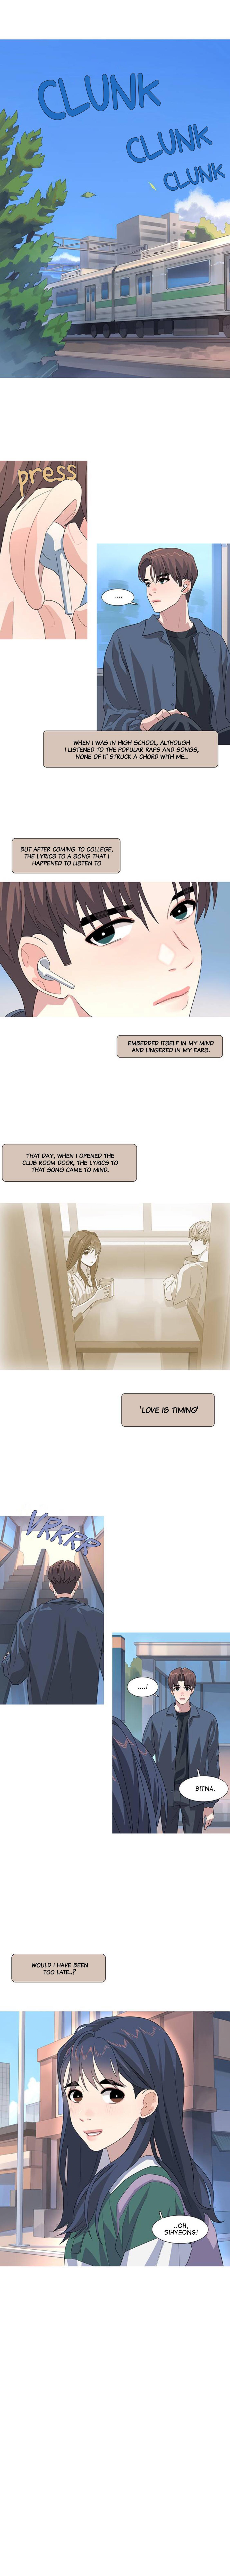 Timid Palette Chapter 61 page 1 - Mangakakalots.com